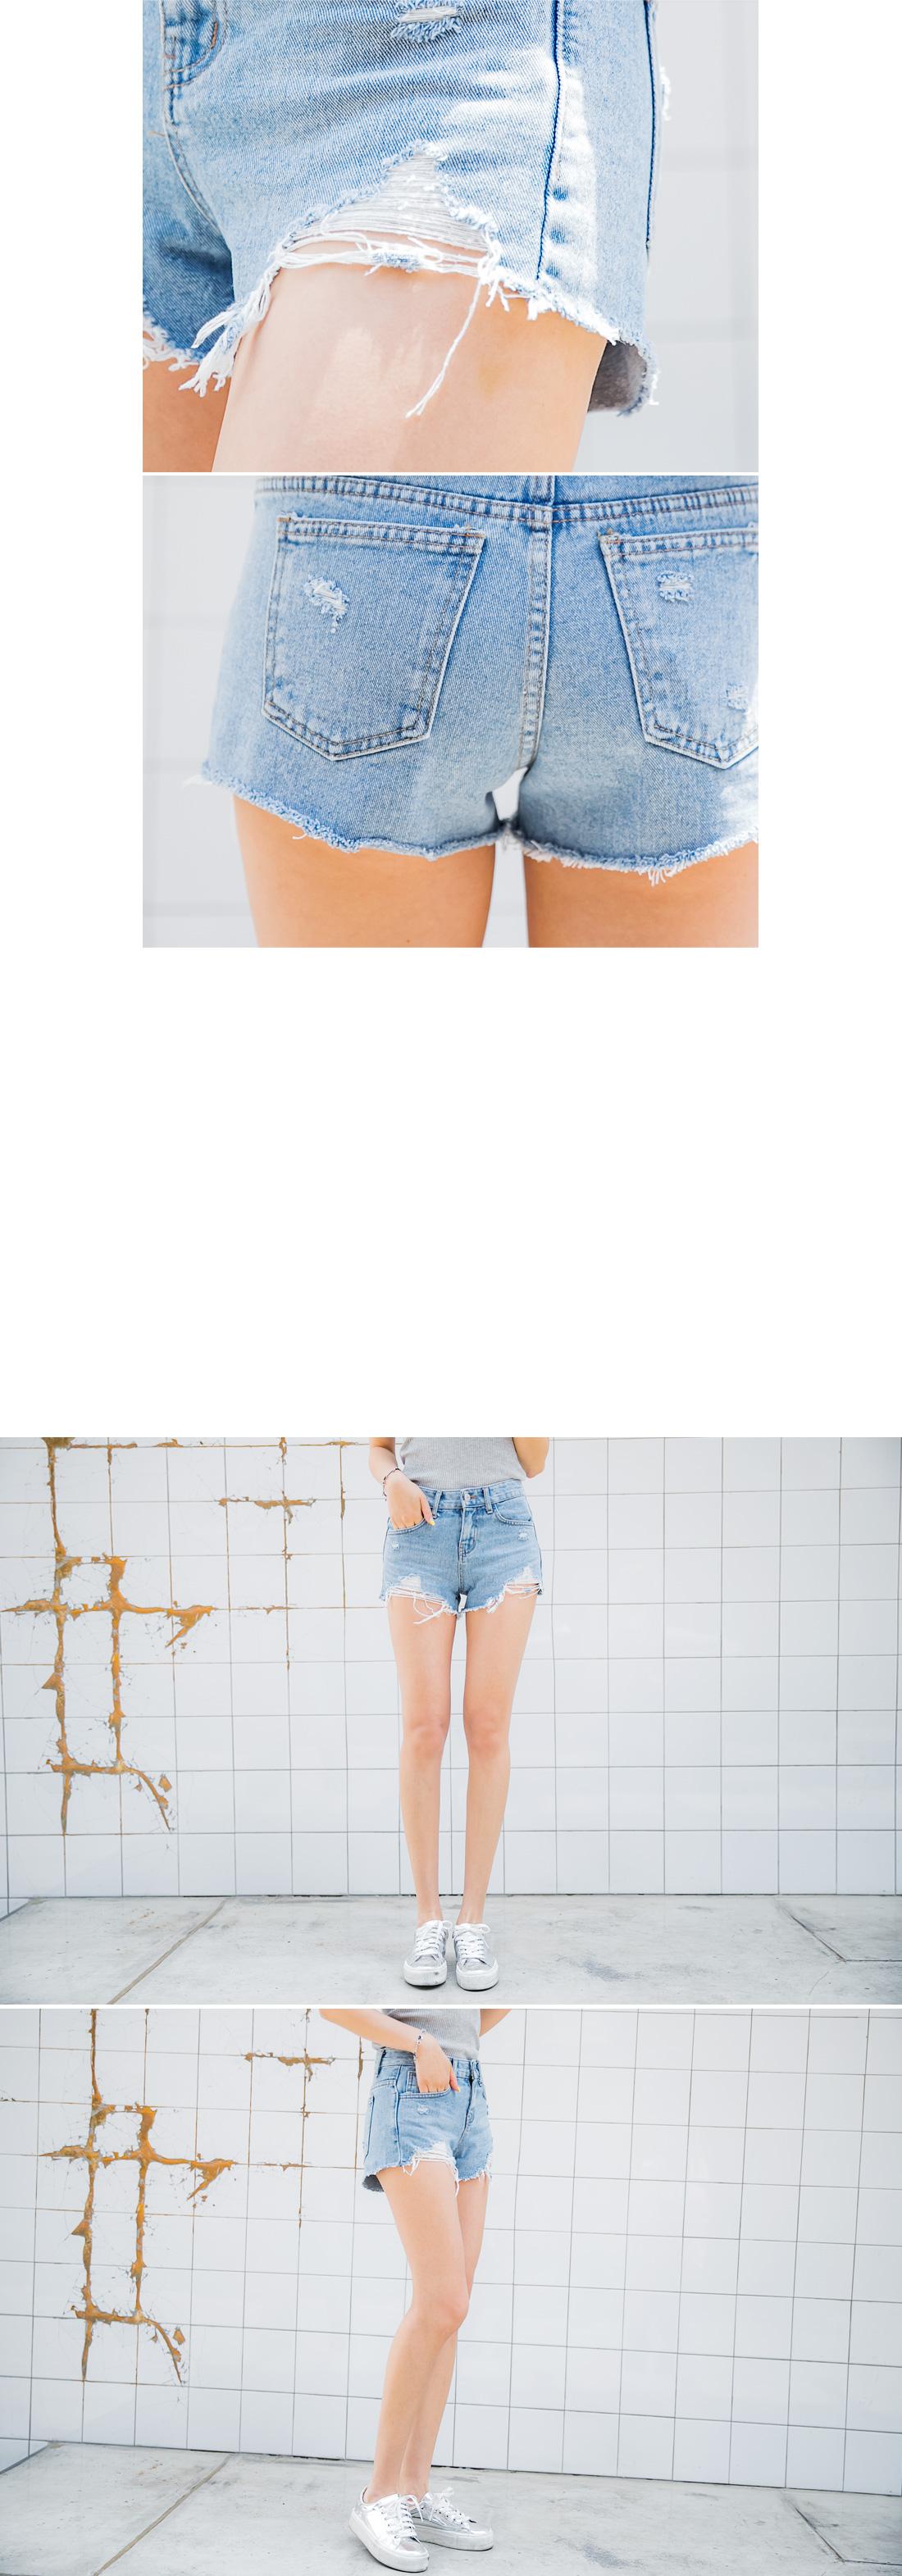 Coco Bone Denim Shorts